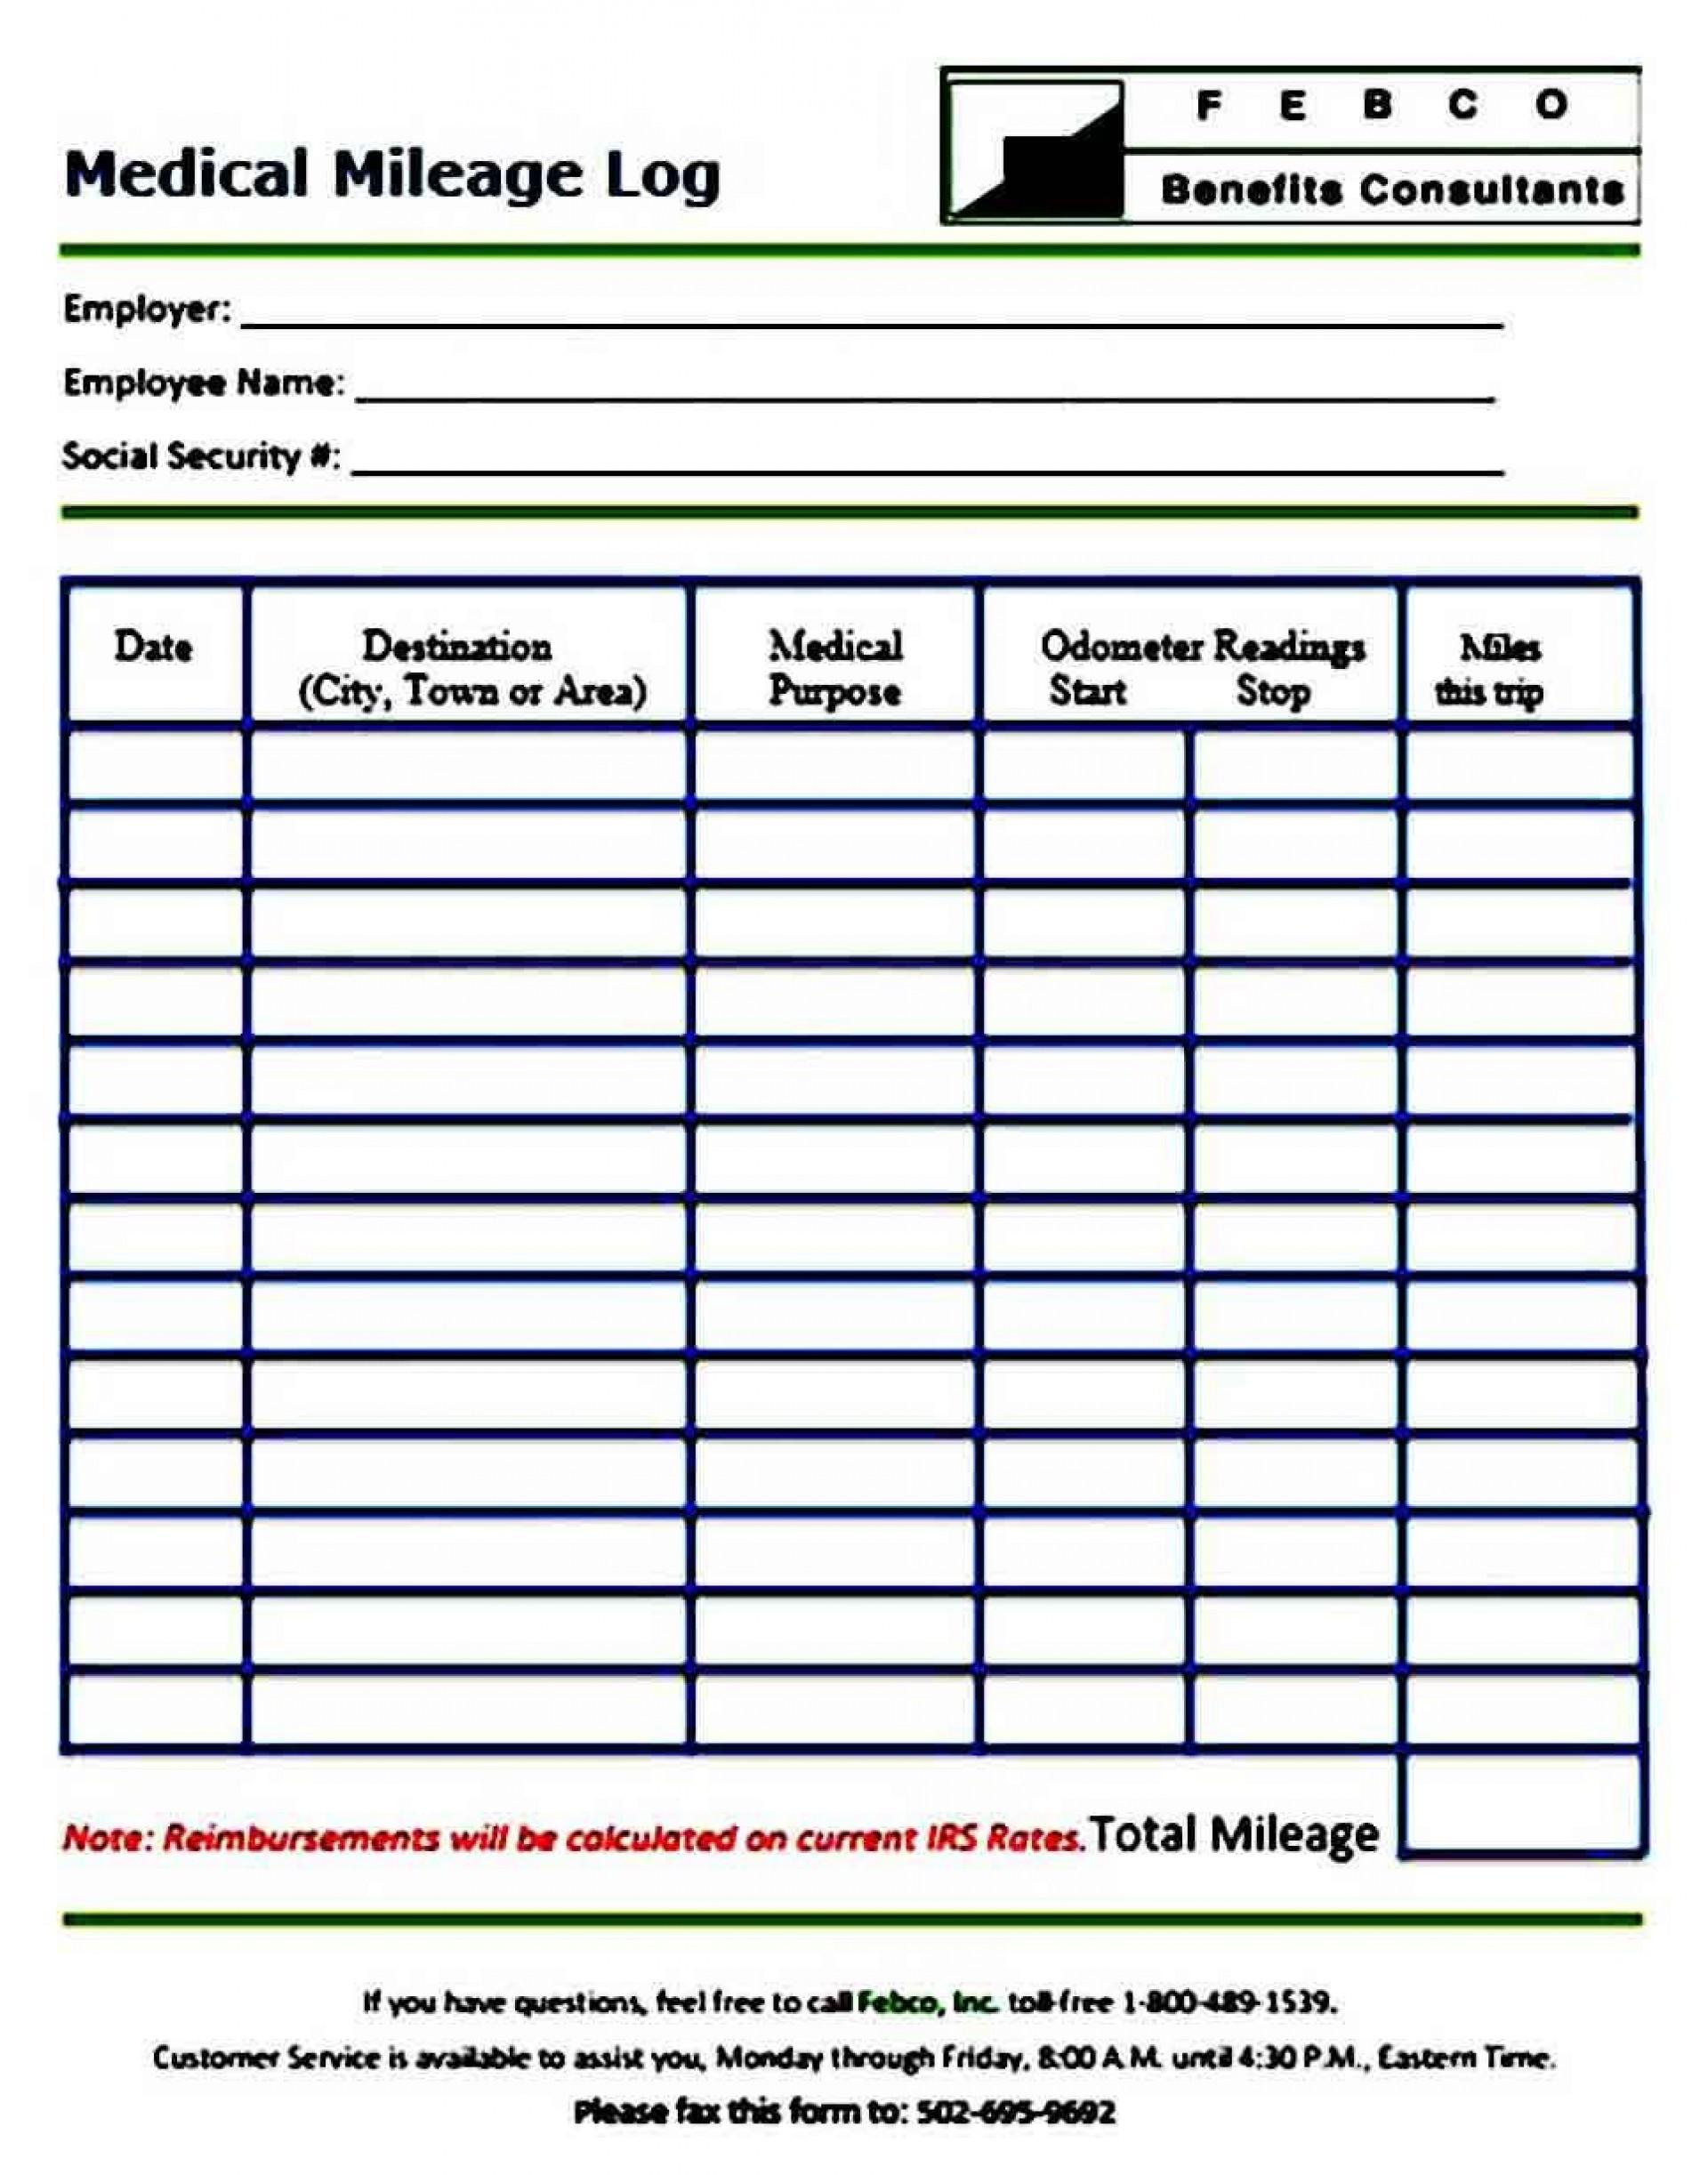 005 Phenomenal Mileage Log Printable Template Example  Book Excel1920